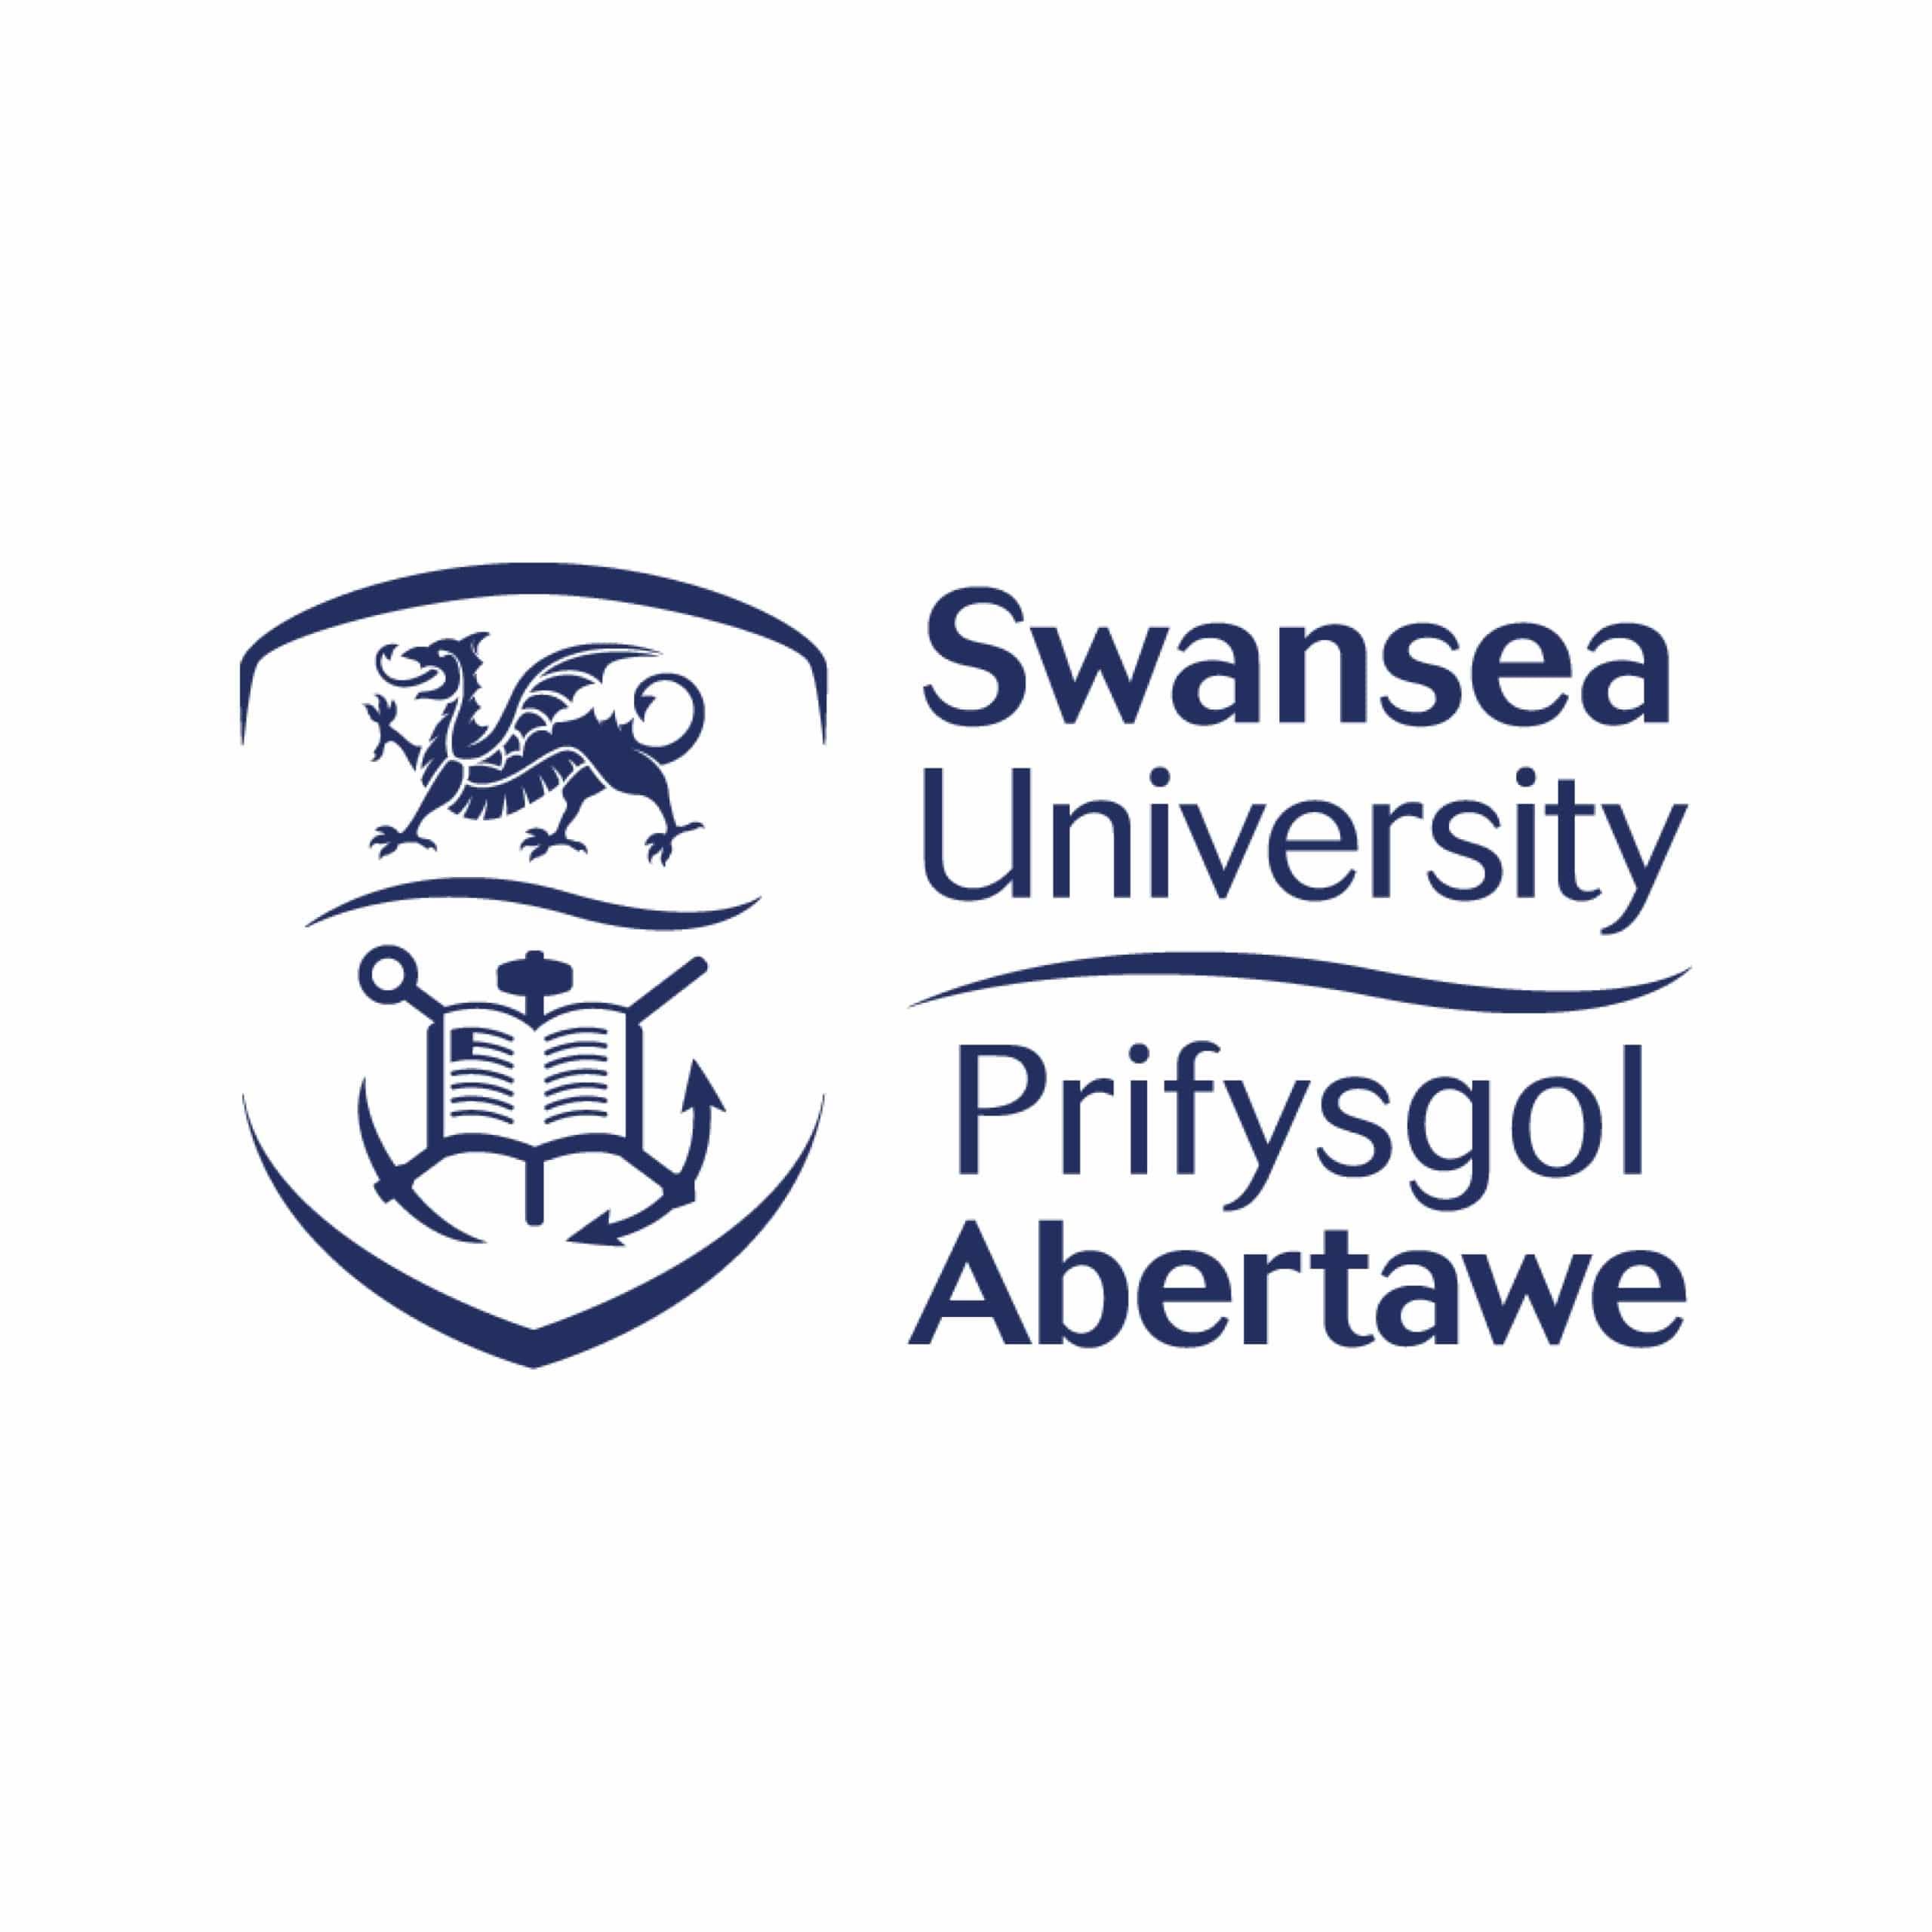 Fineline Print and Web | North Wales | Portfolio | Swansea University